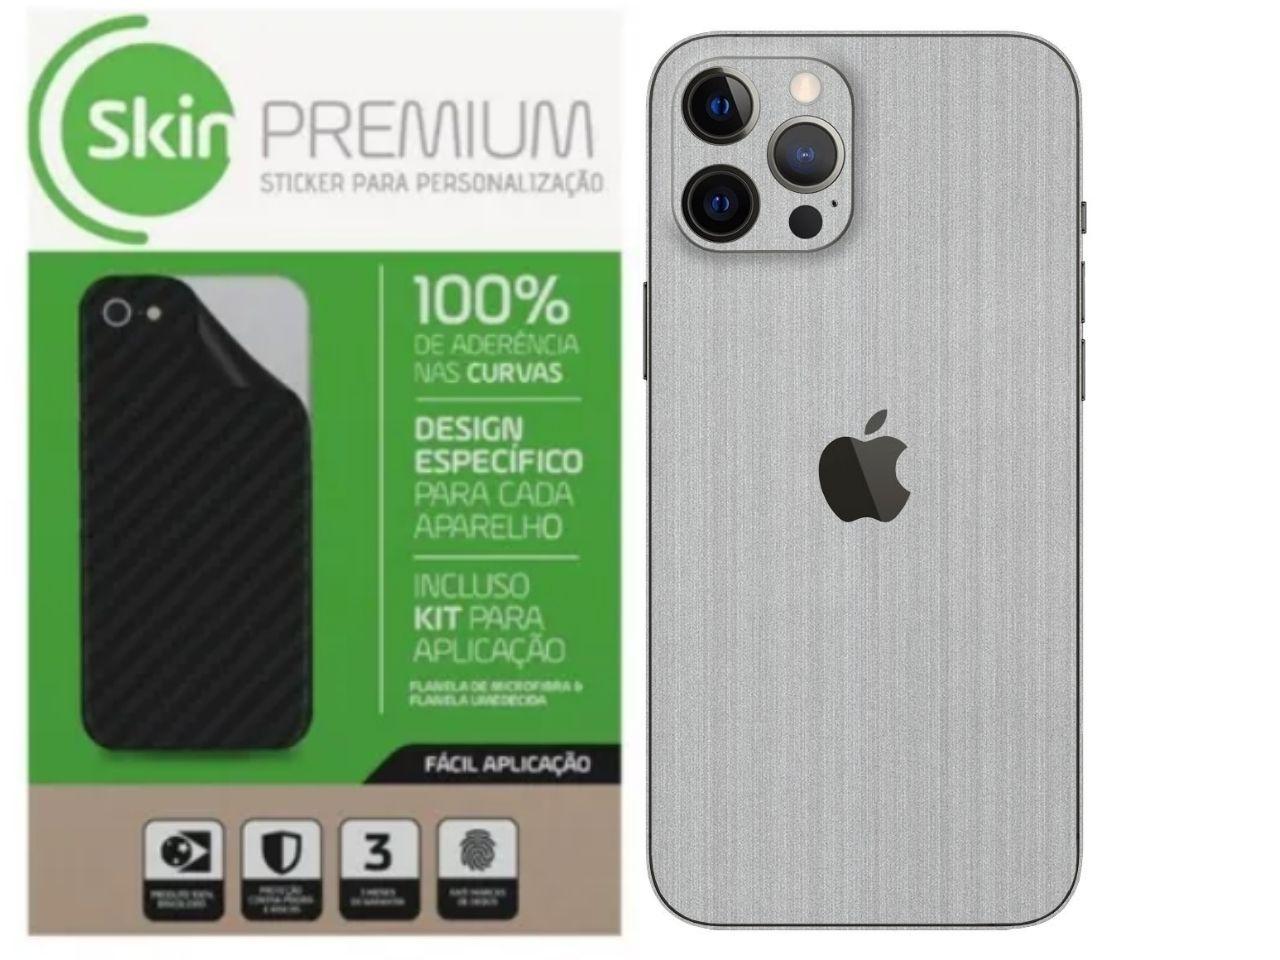 Skin Premium Verso e Laterais Estampa de Aço Escovado para Iphone 12 Pro Max